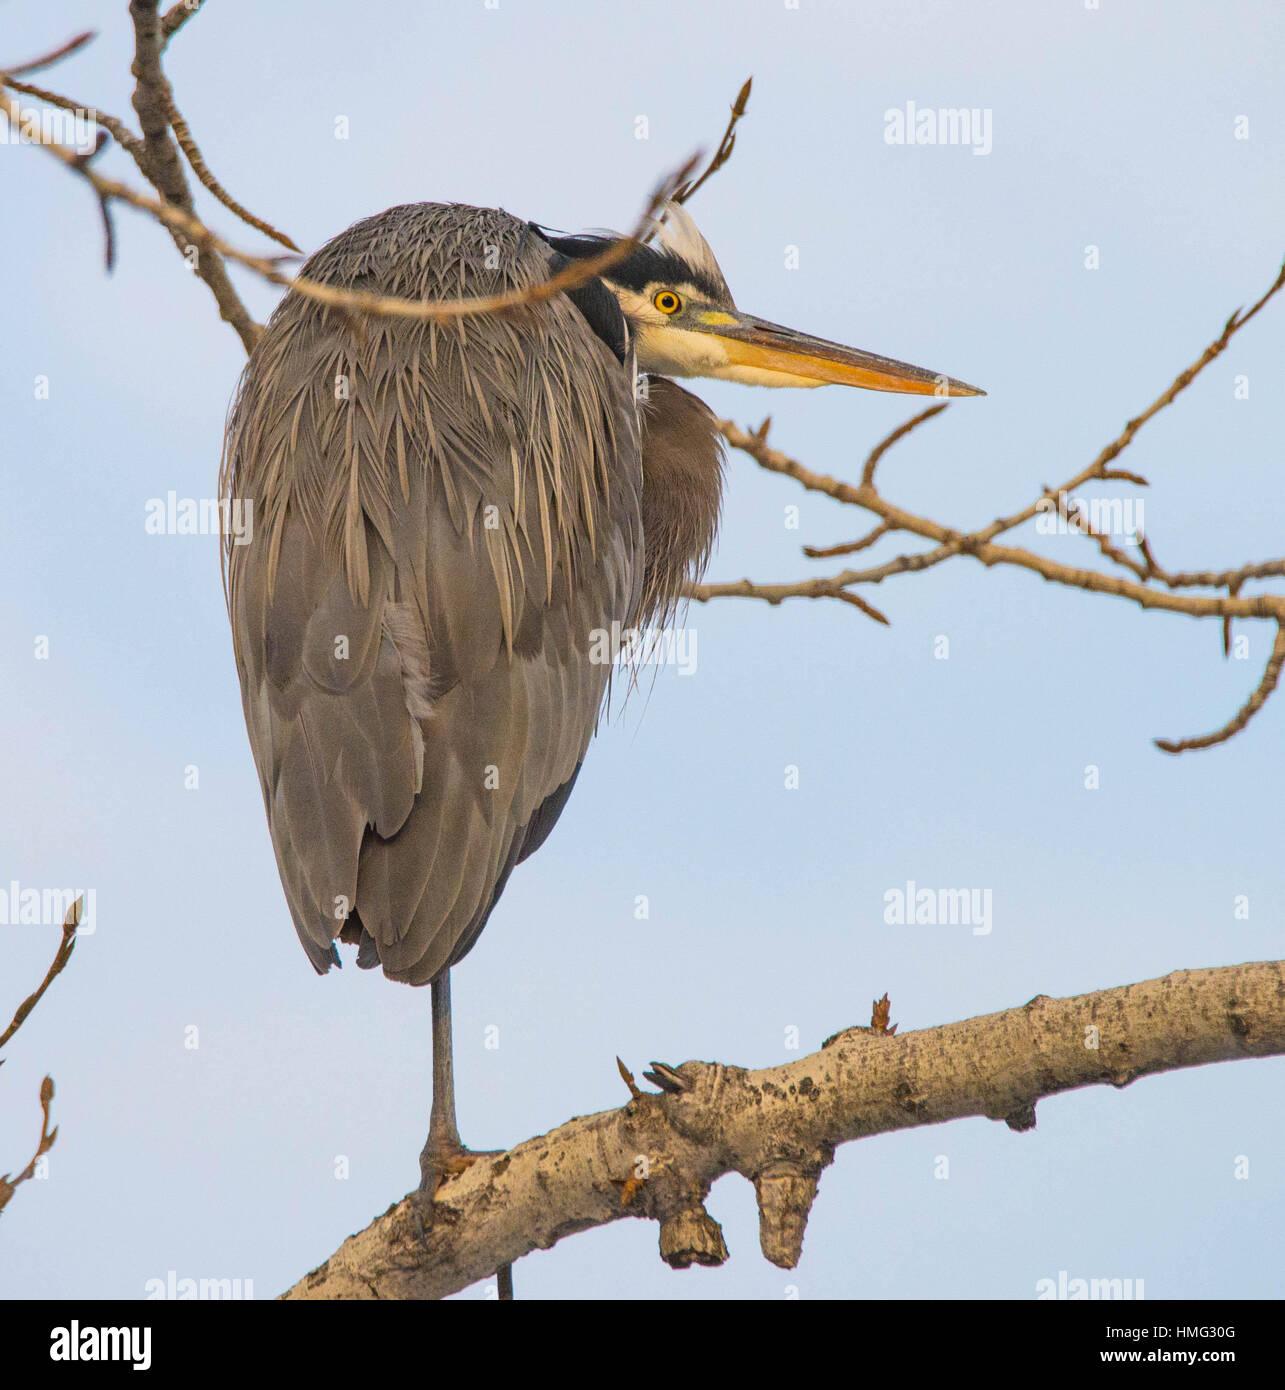 Vögel, Great Blue Heron thront auf einem Ast im Winter. Idaho, USA Stockbild